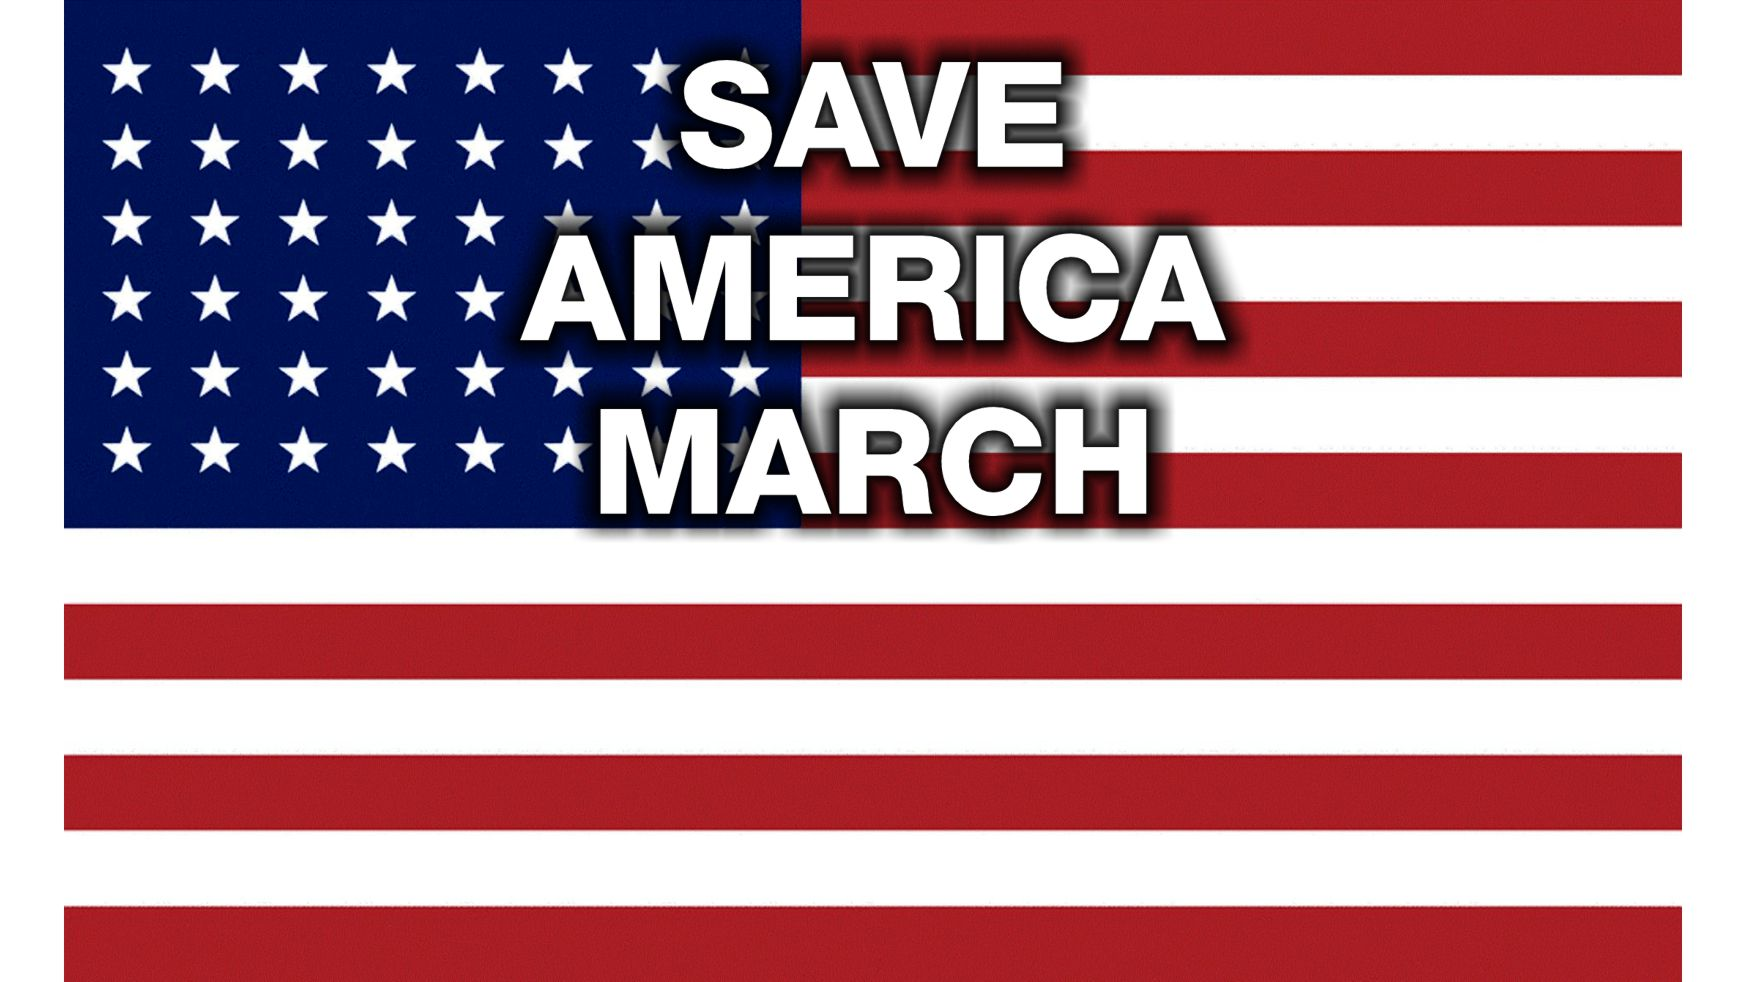 Save America March